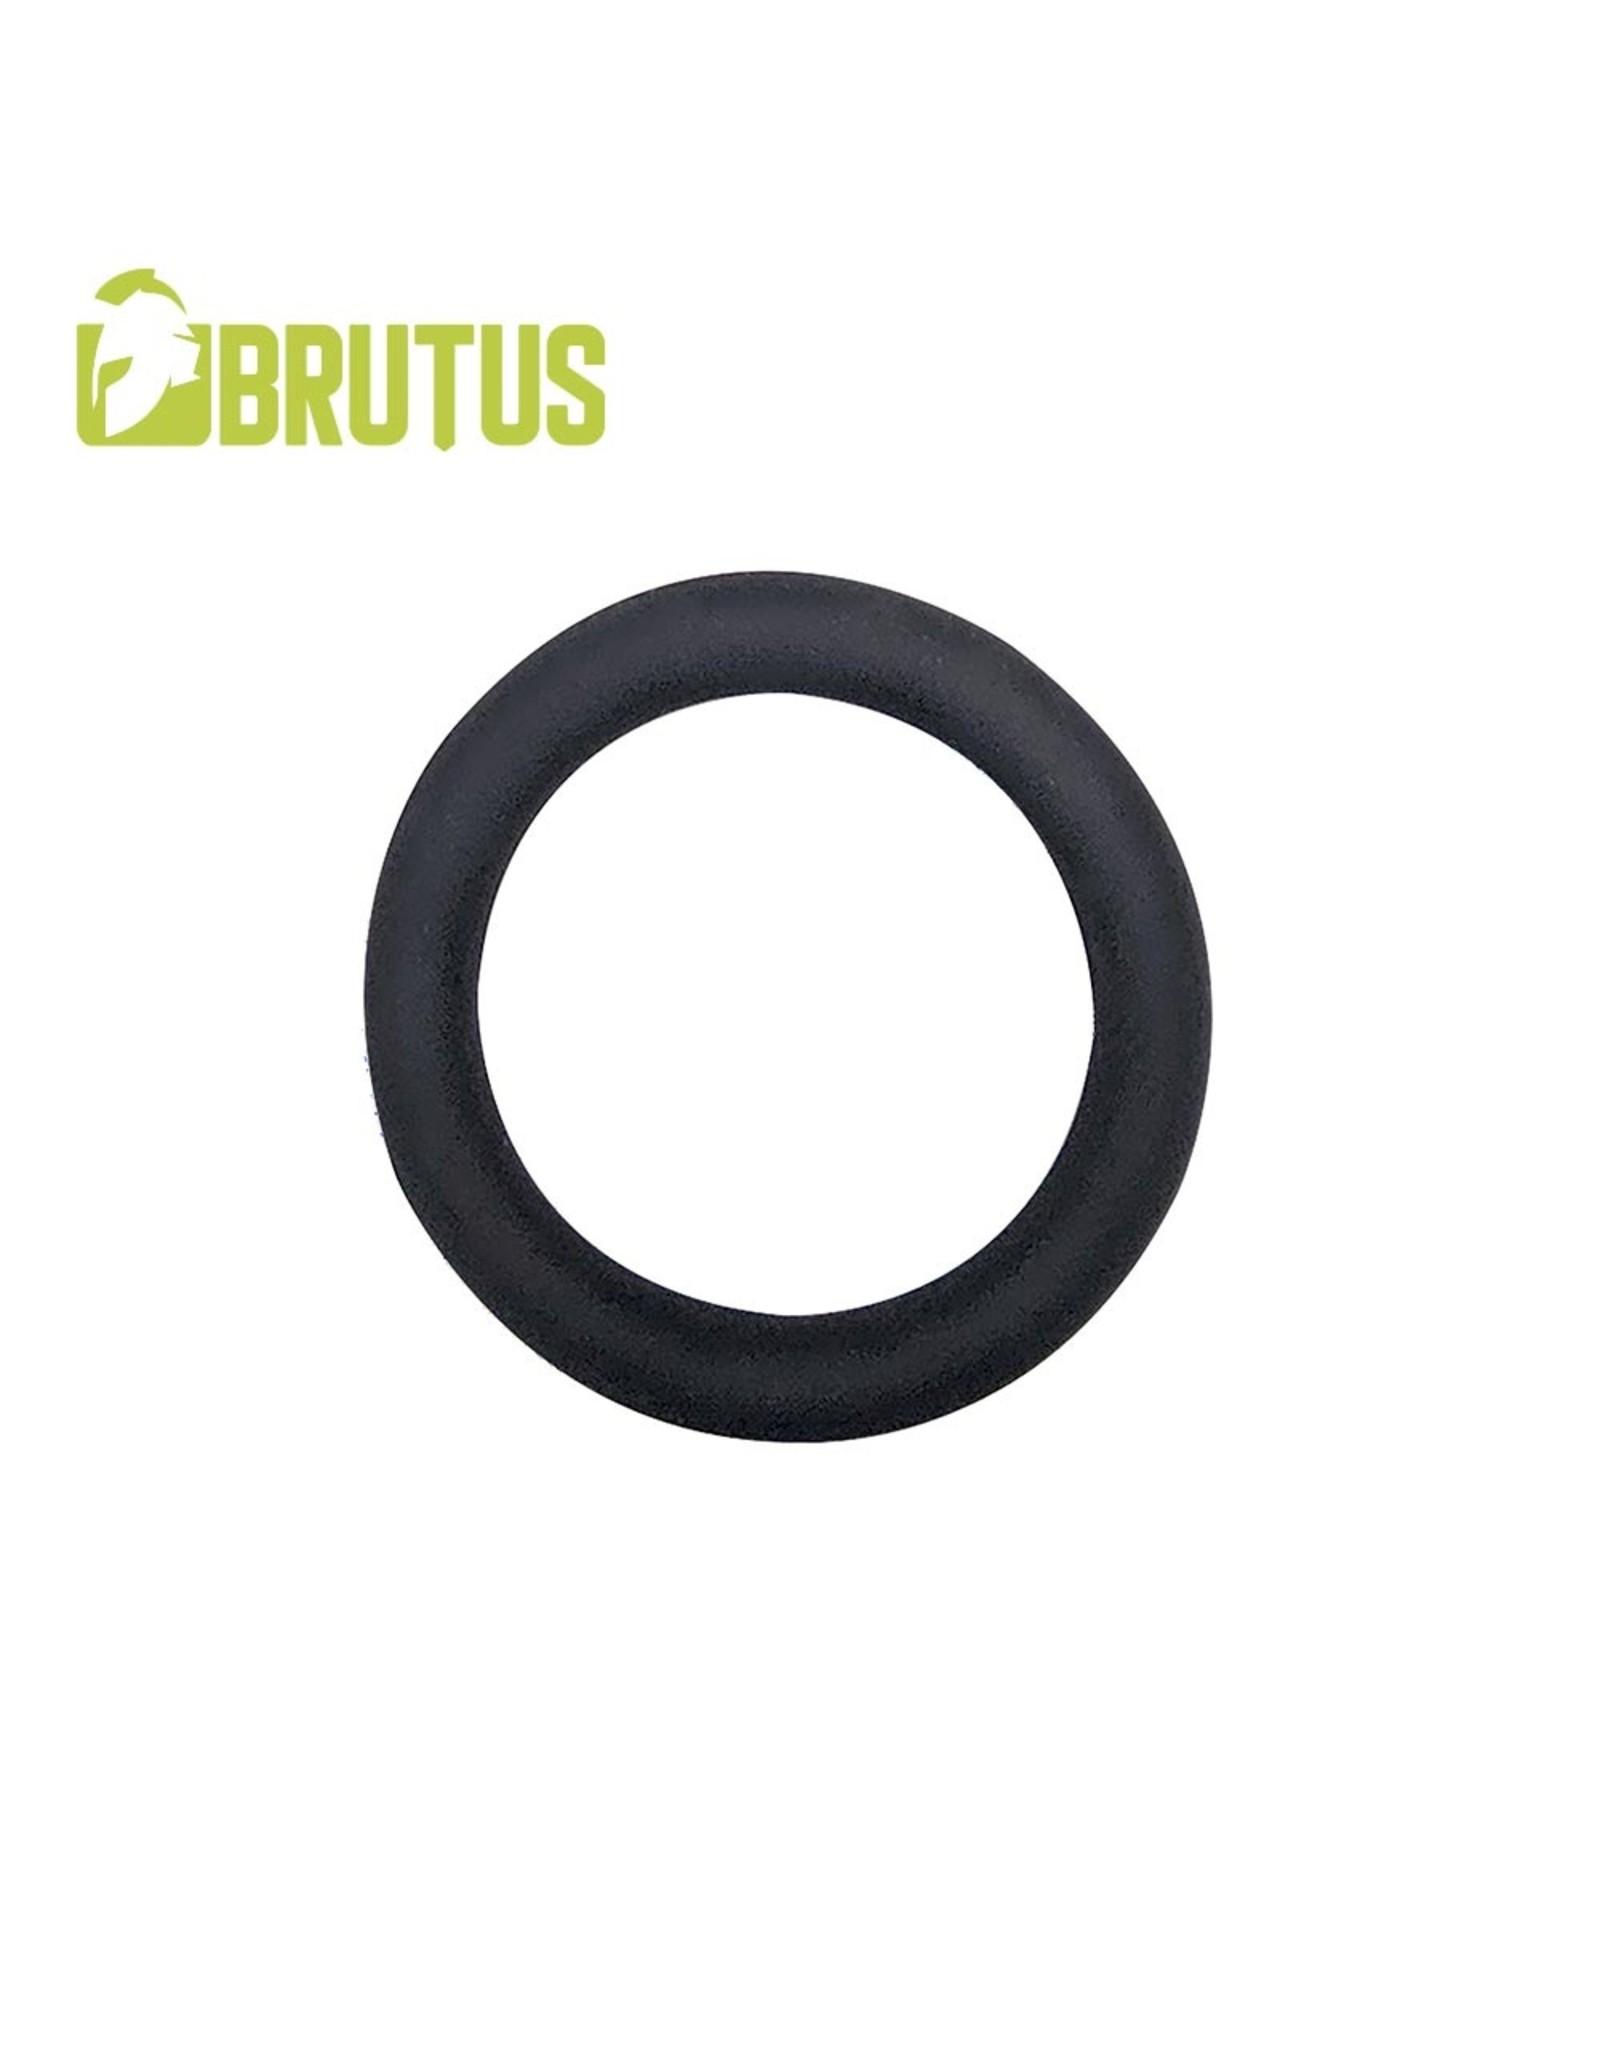 Brutus Slim Donut Silicone Cock Ring